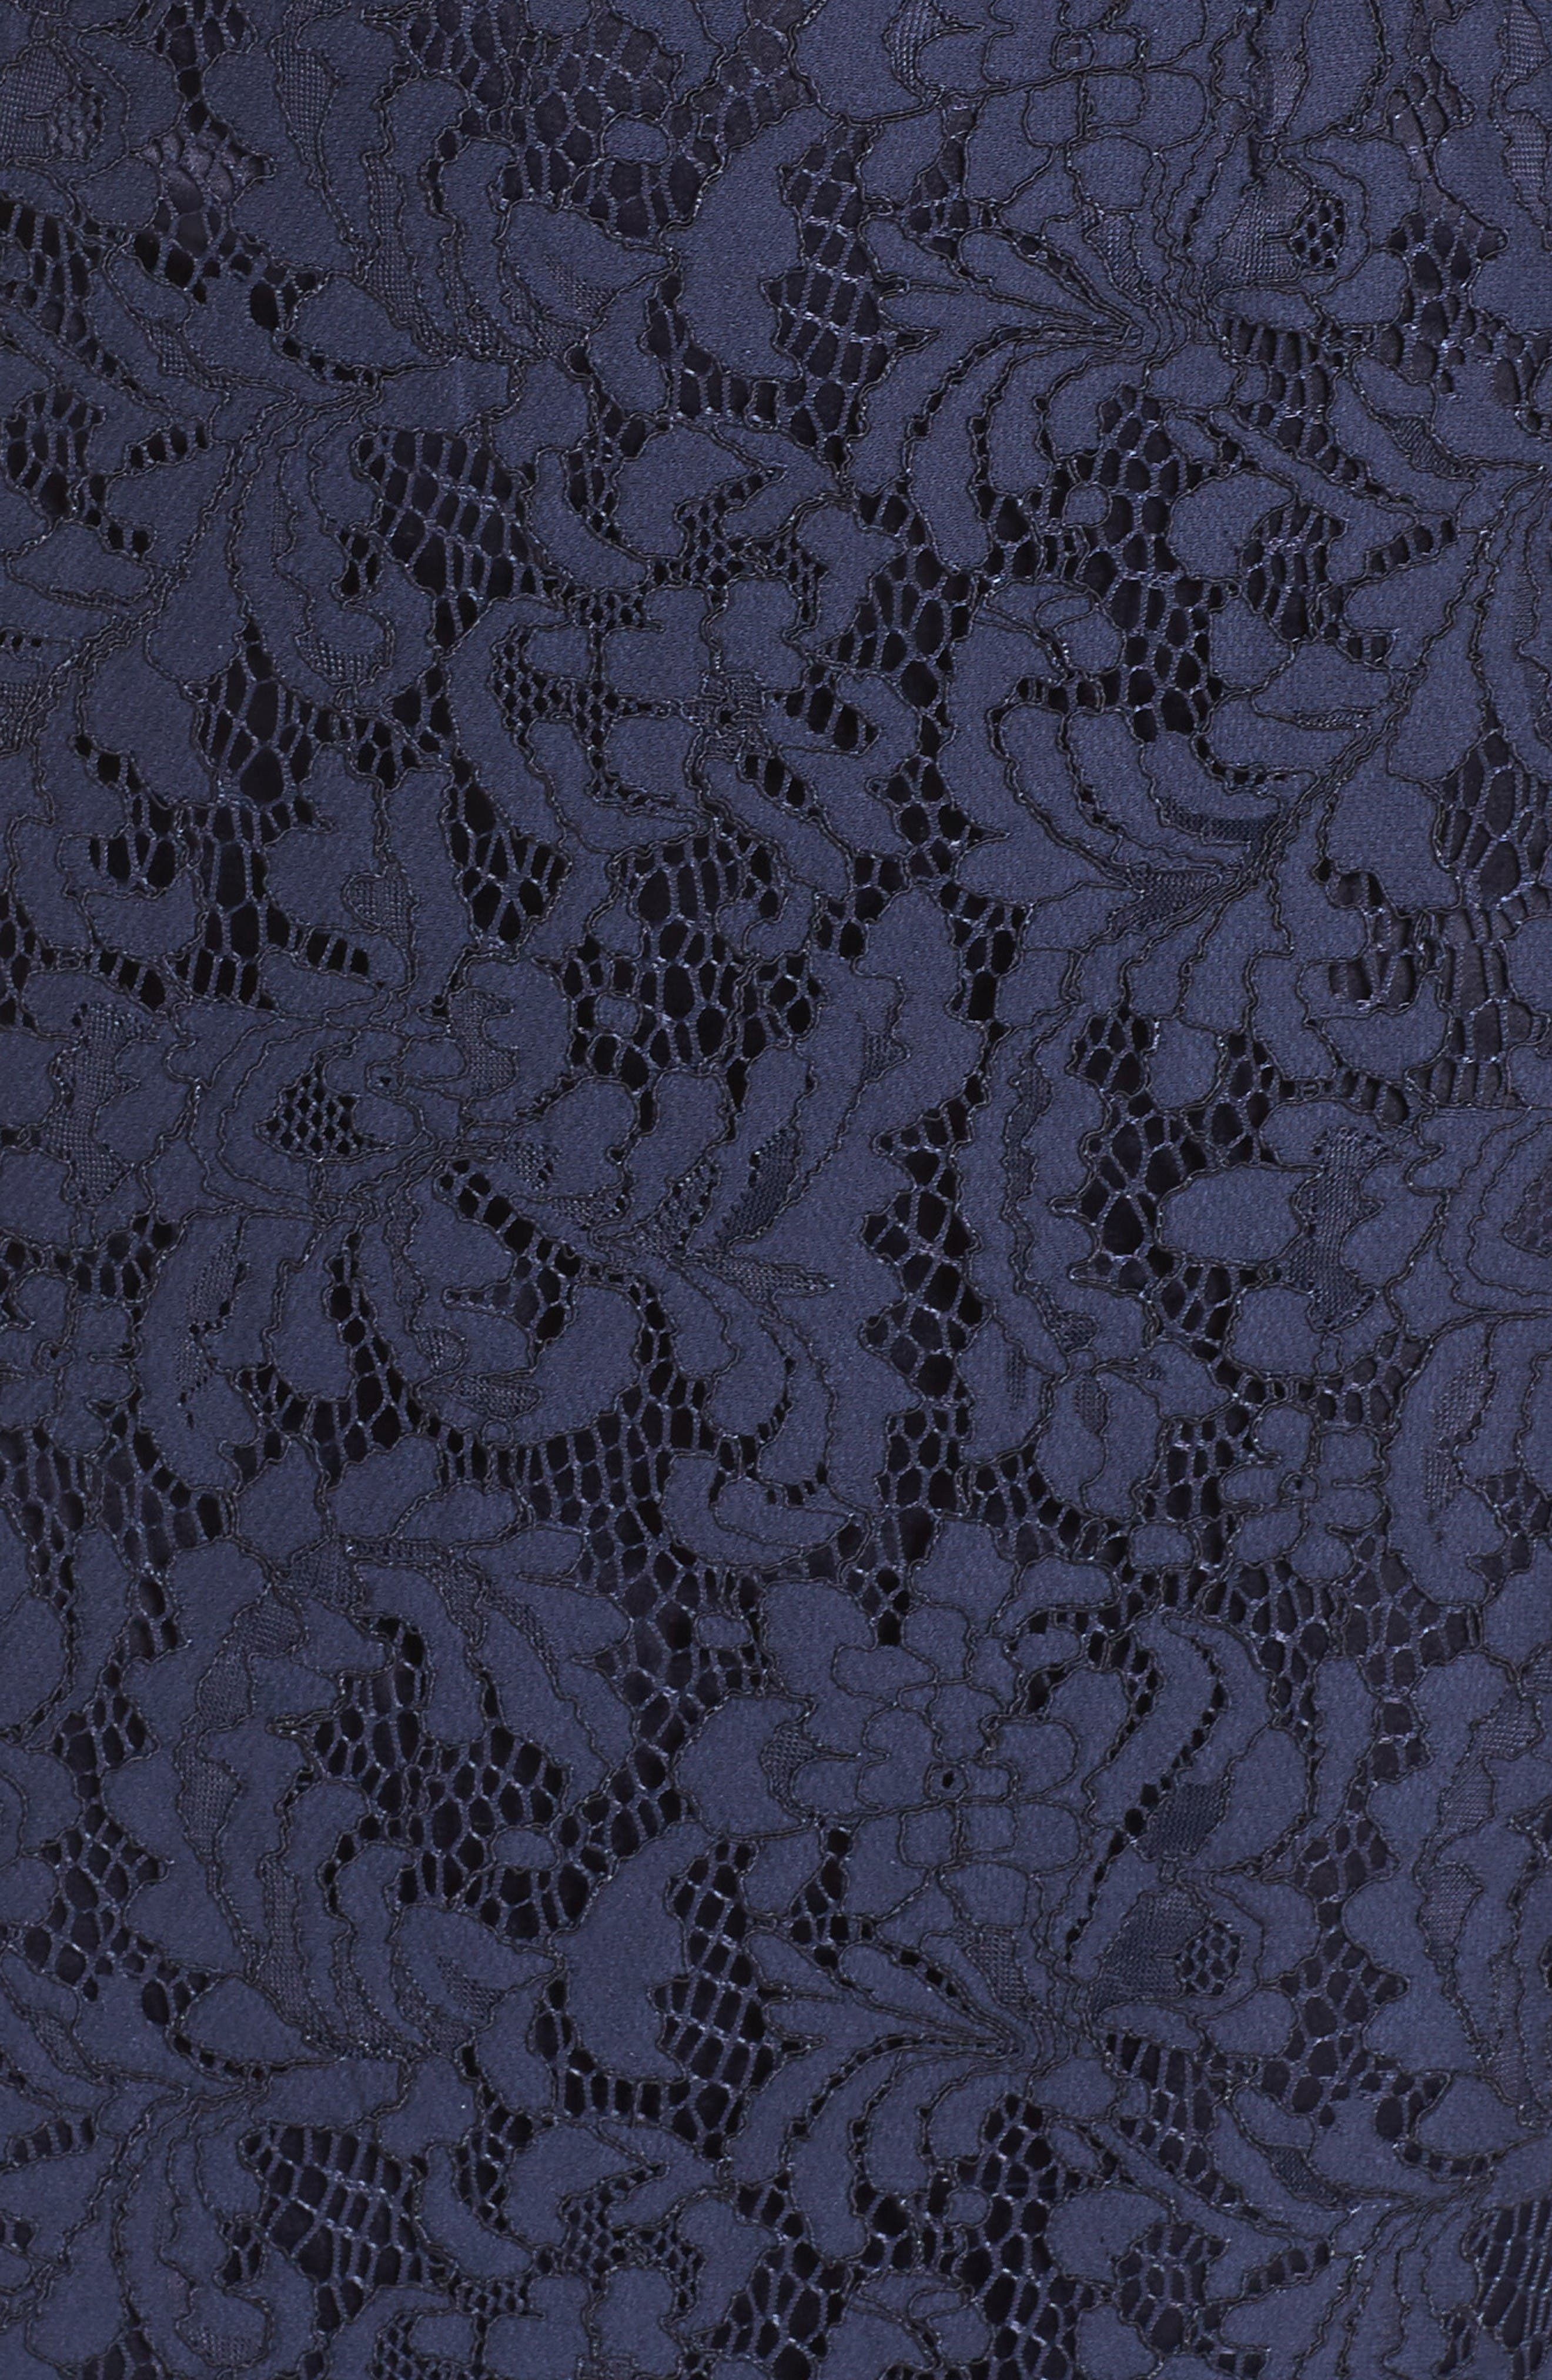 One-Shoulder Lace Dress,                             Alternate thumbnail 6, color,                             Navy